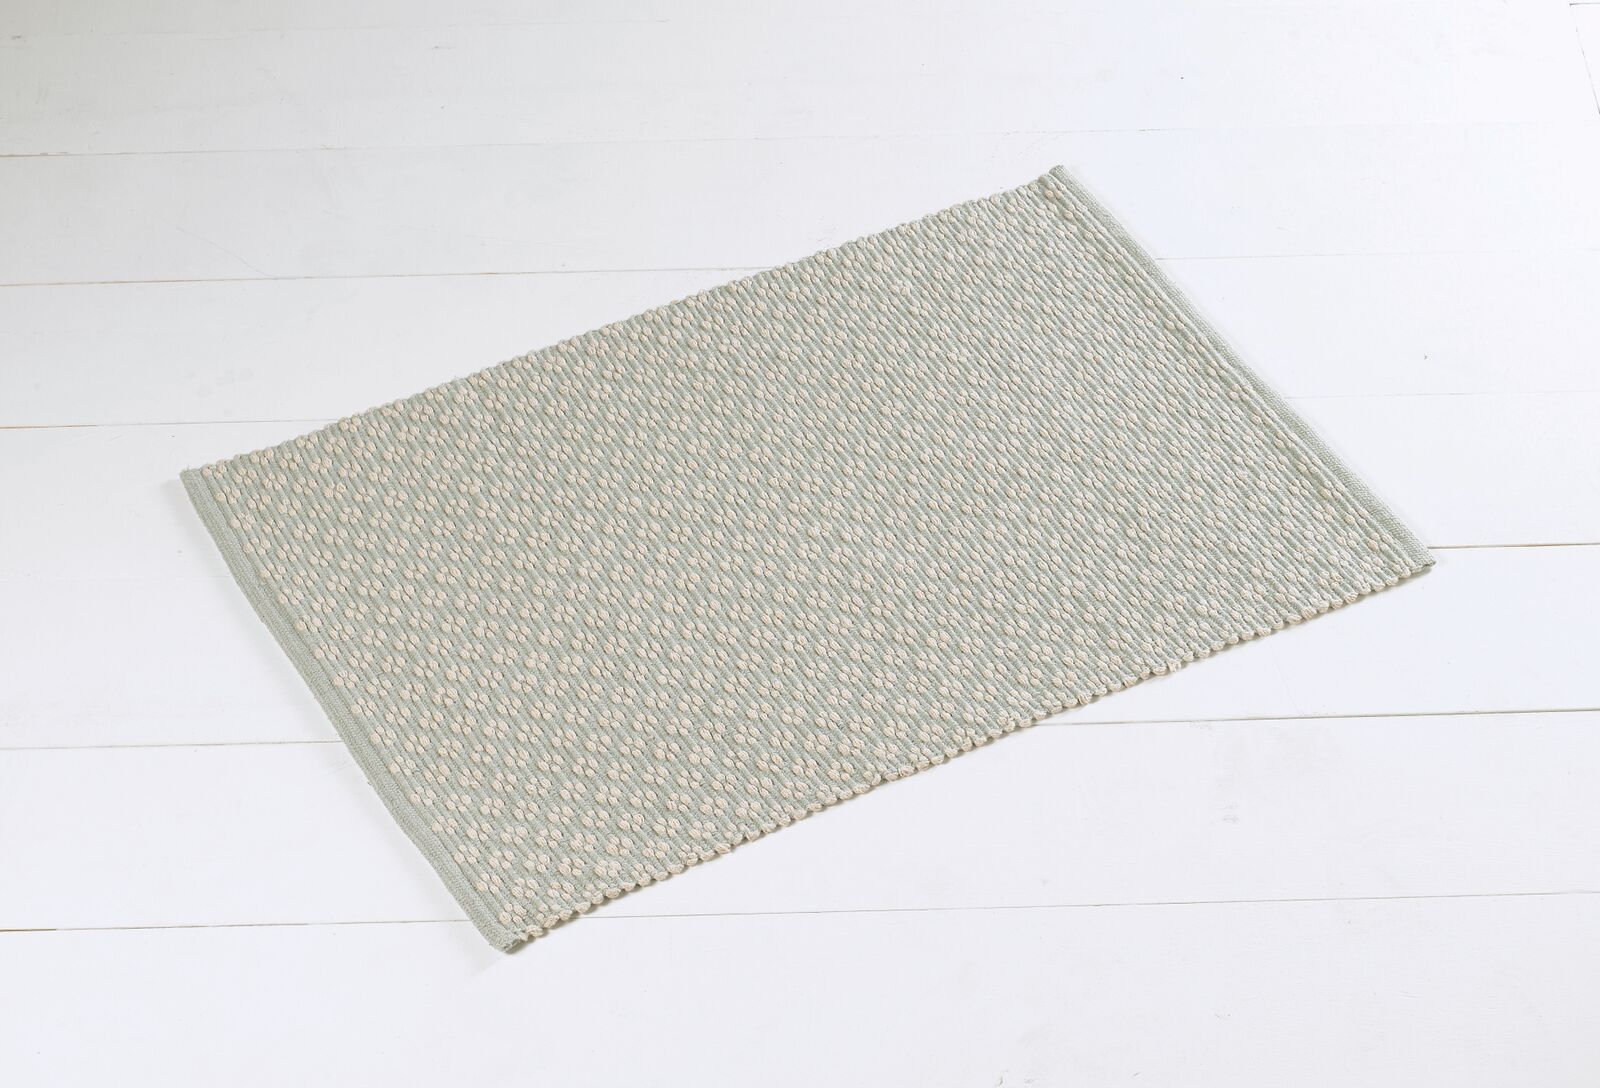 ASTER RUG SMALL AQUA (60cm x 90cm): €23